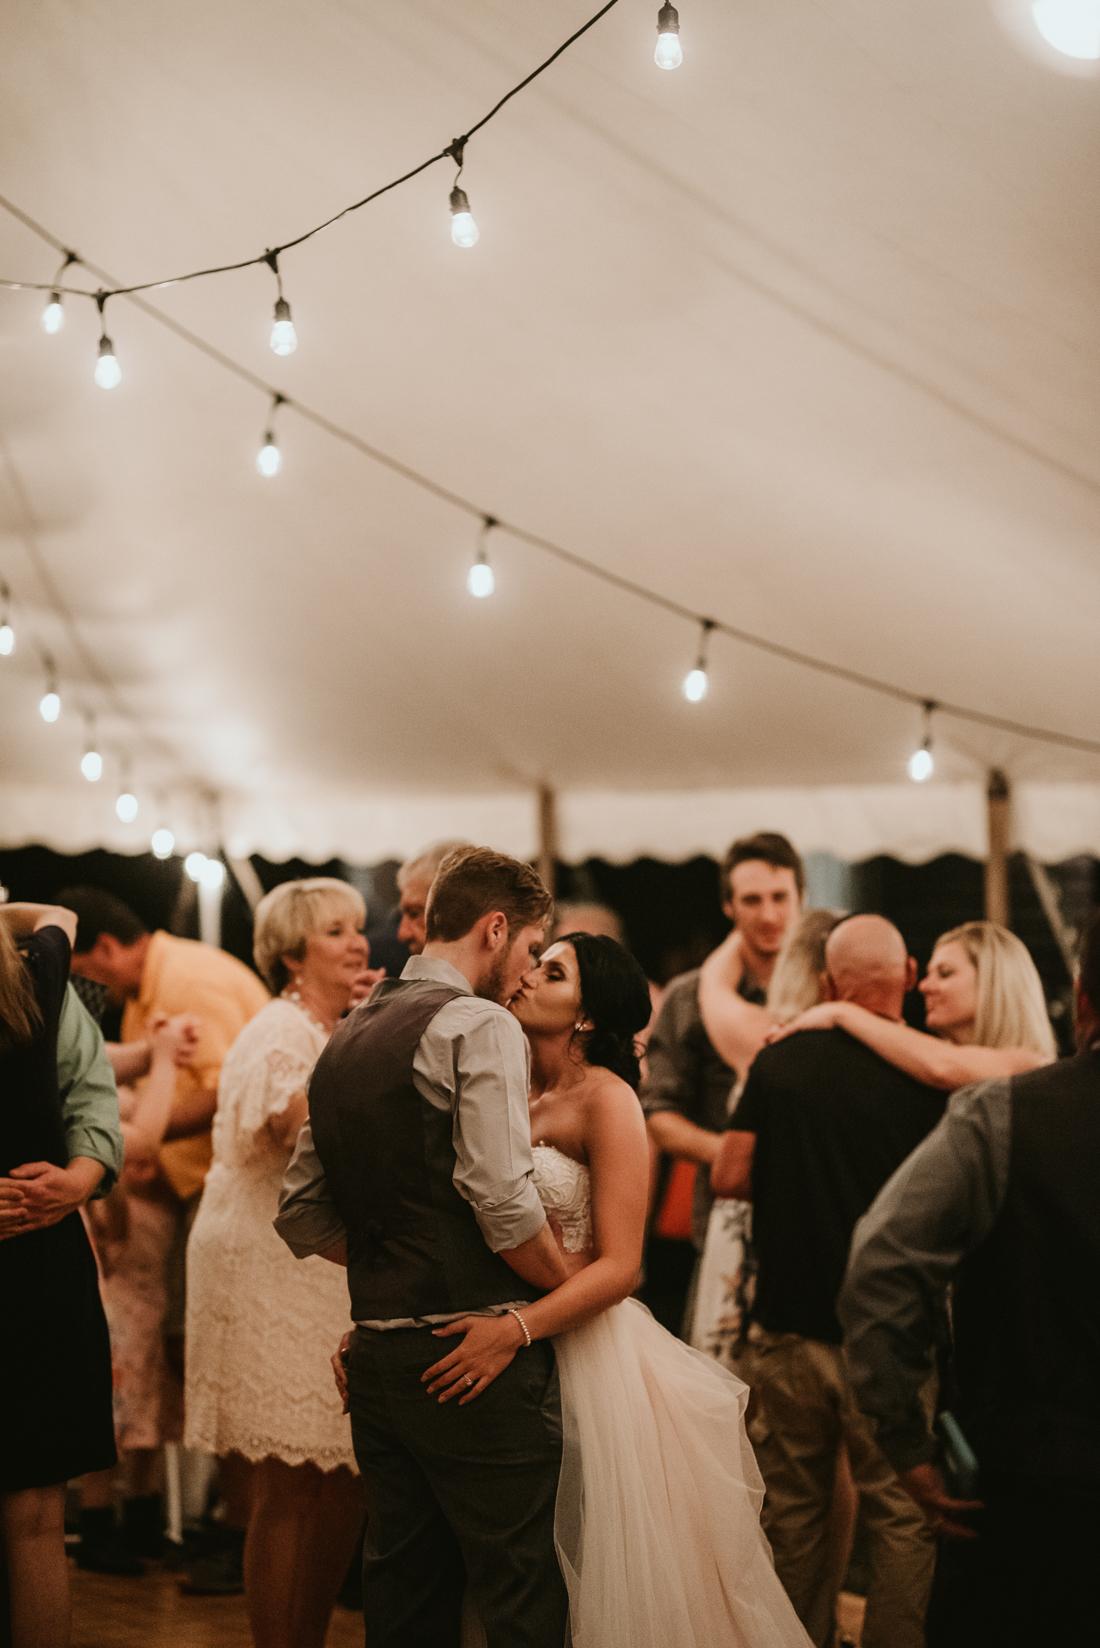 olivia_zay_wedding_09_2018-8015.jpg